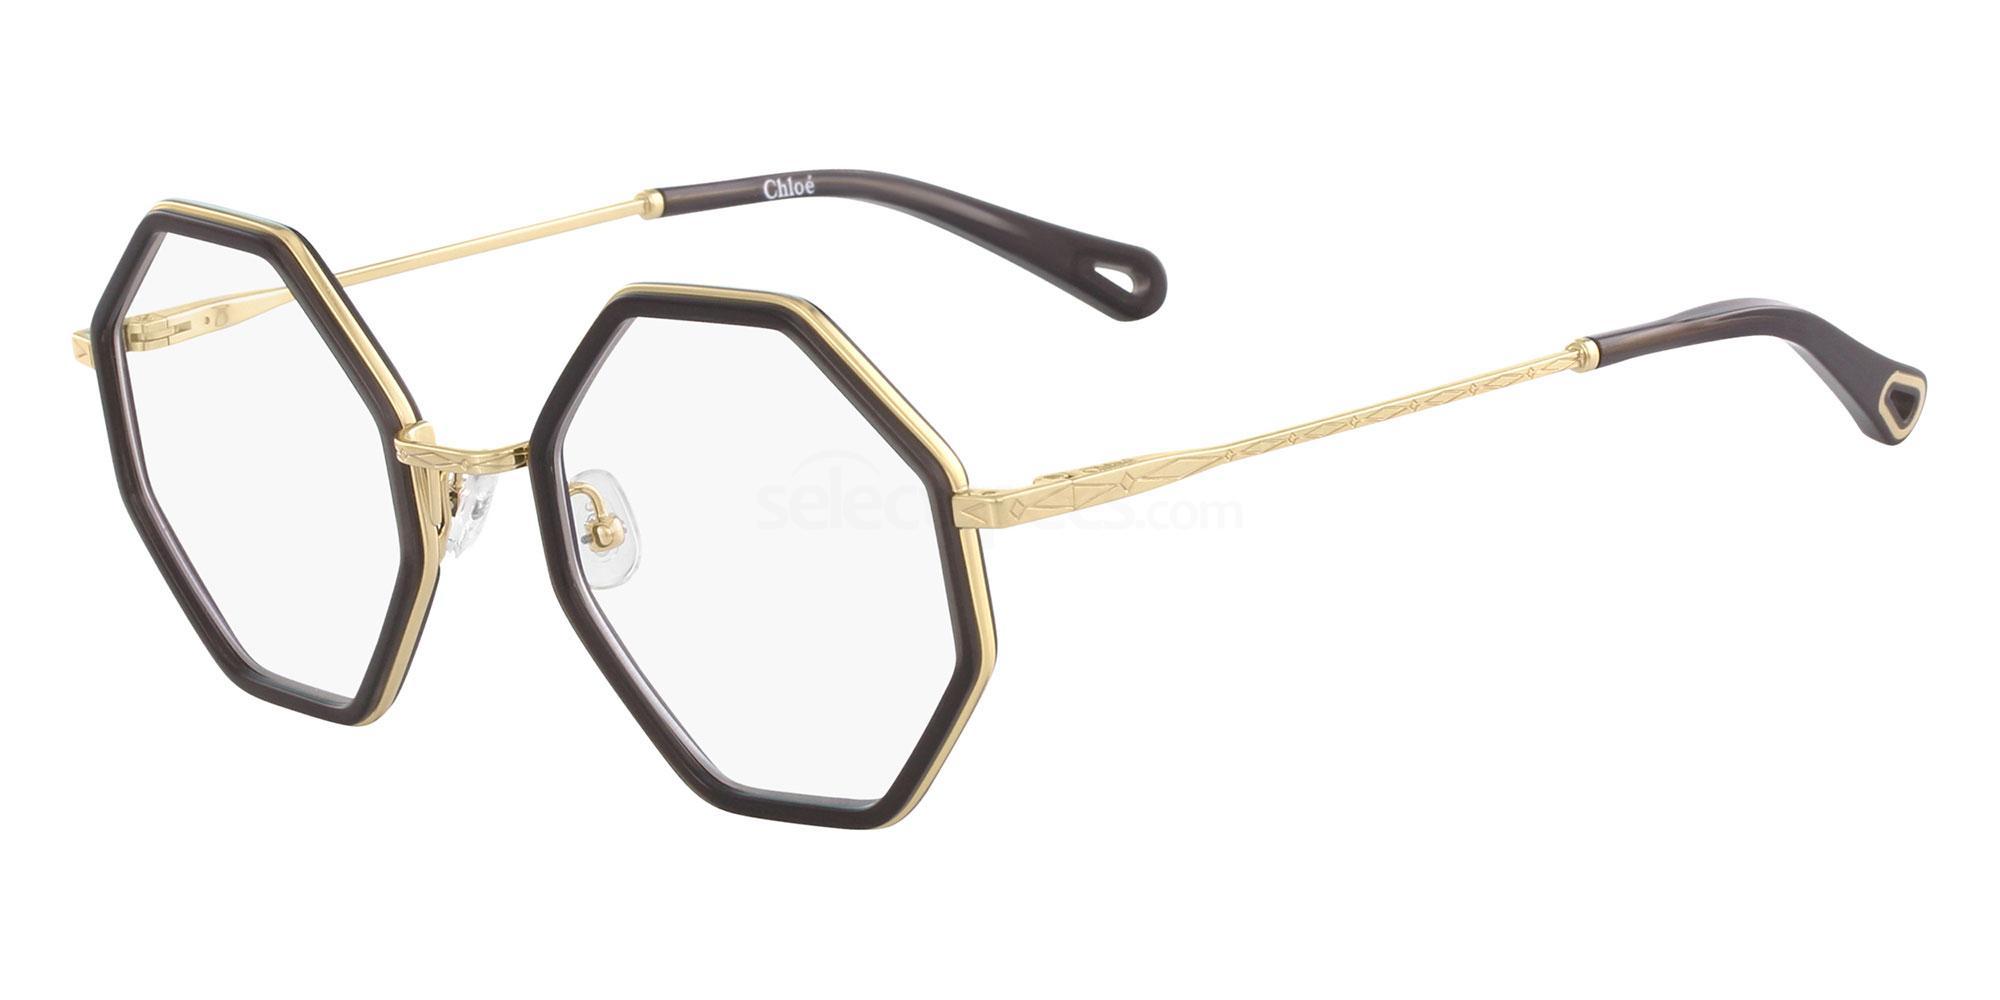 036 CE2142 Glasses, Chloe